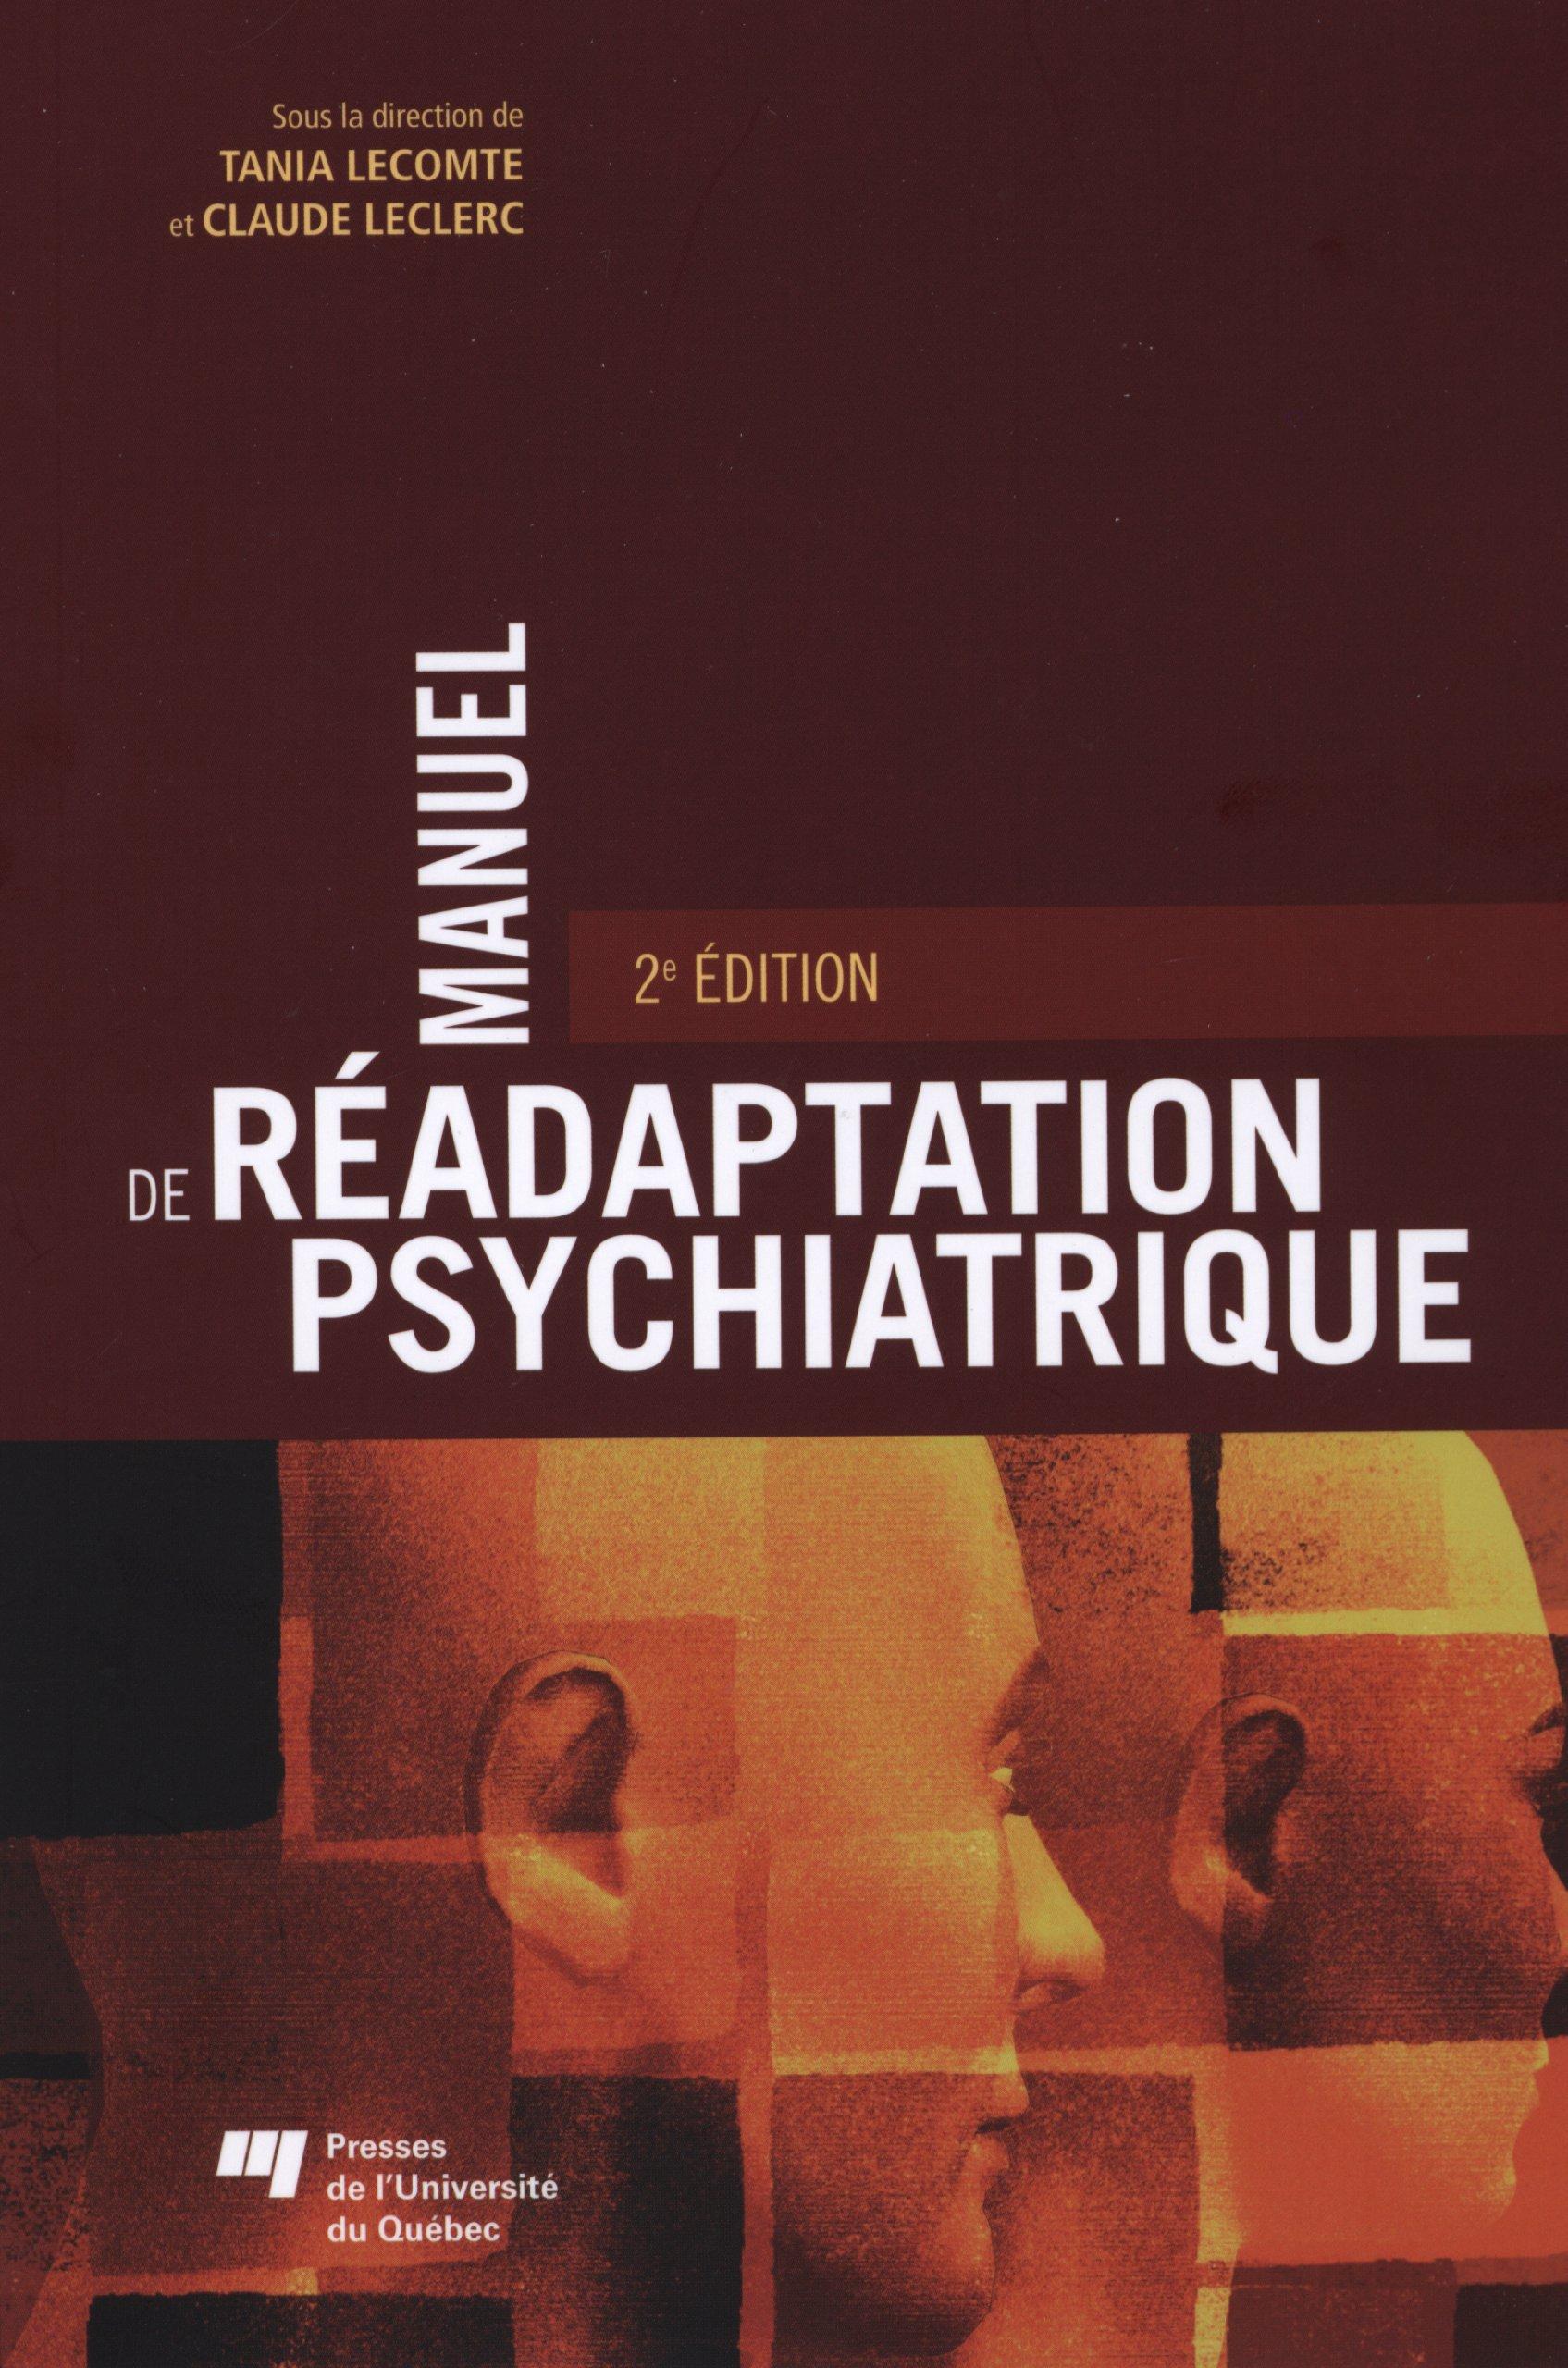 Amazon Fr Manuel De Readaptation Psychiatrique Tania Lecomte